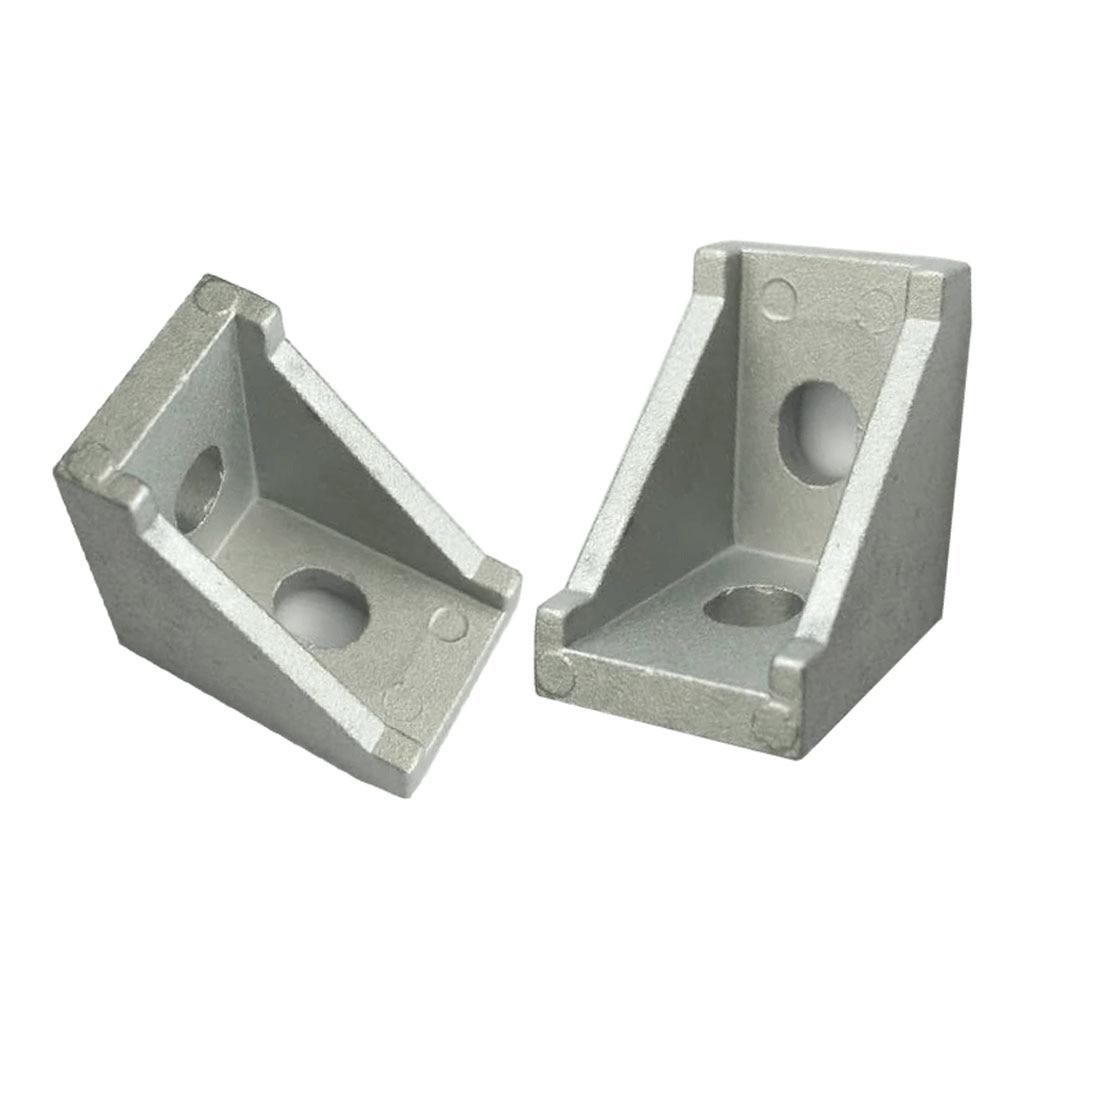 10pcs/set 20x20mm Metal Aluminium Corner Brackets Used for Reinforcing Inside of Right Angle Corner Joints